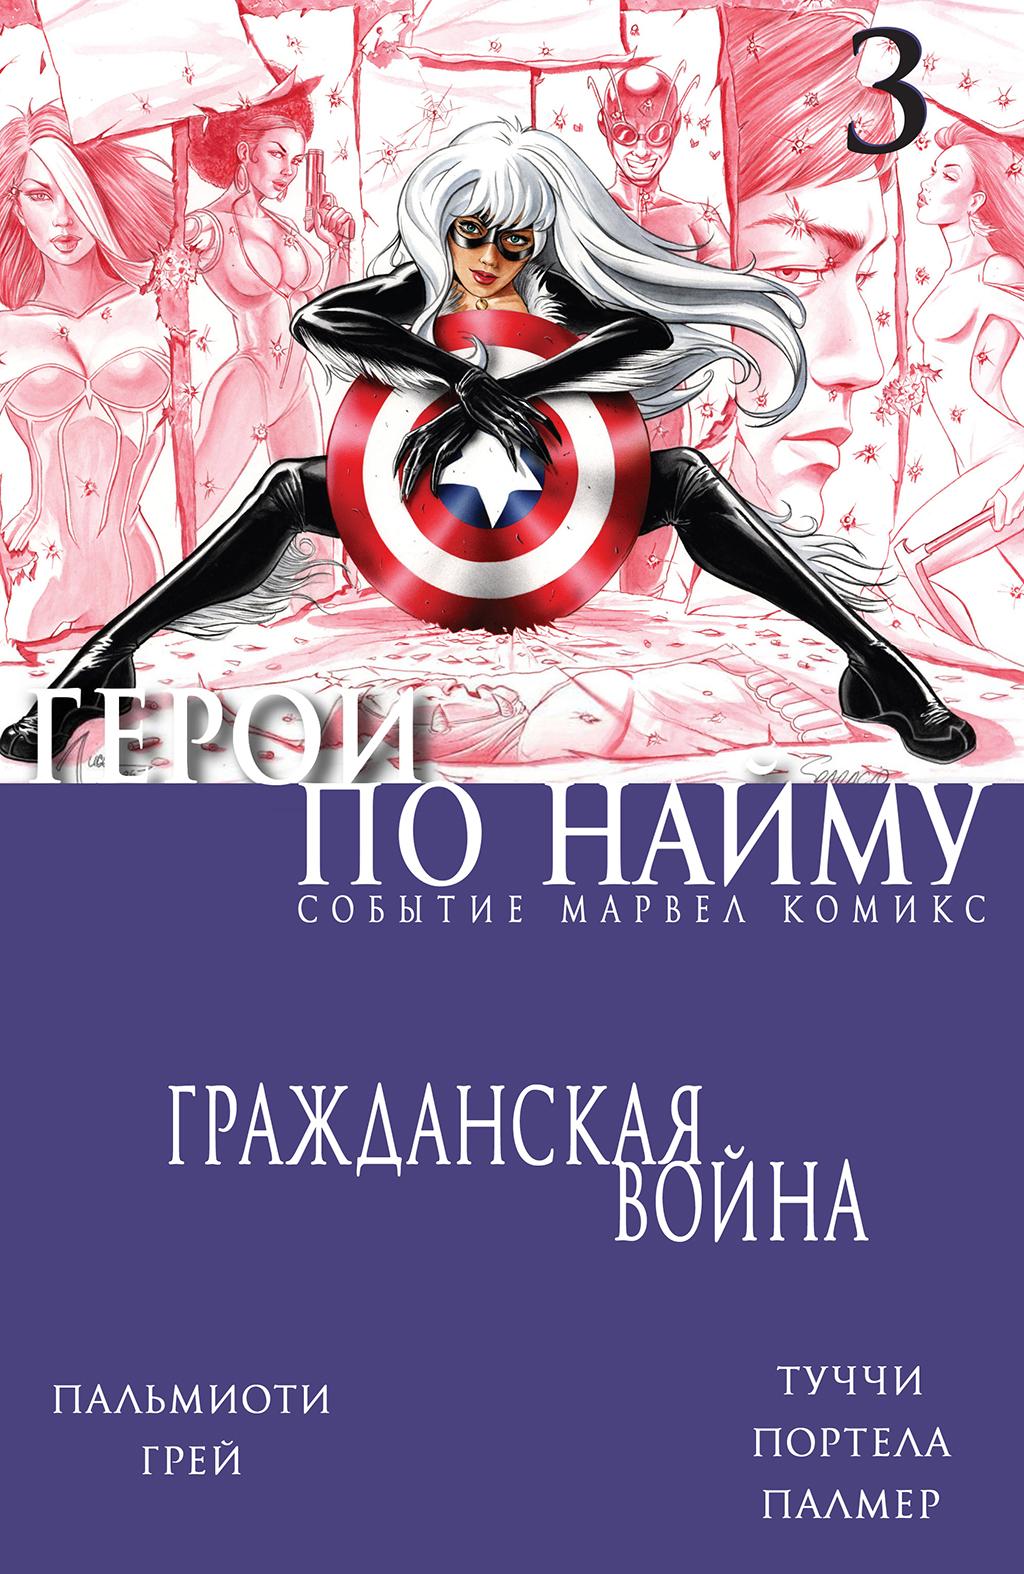 комикс Герои по Найму Том 2